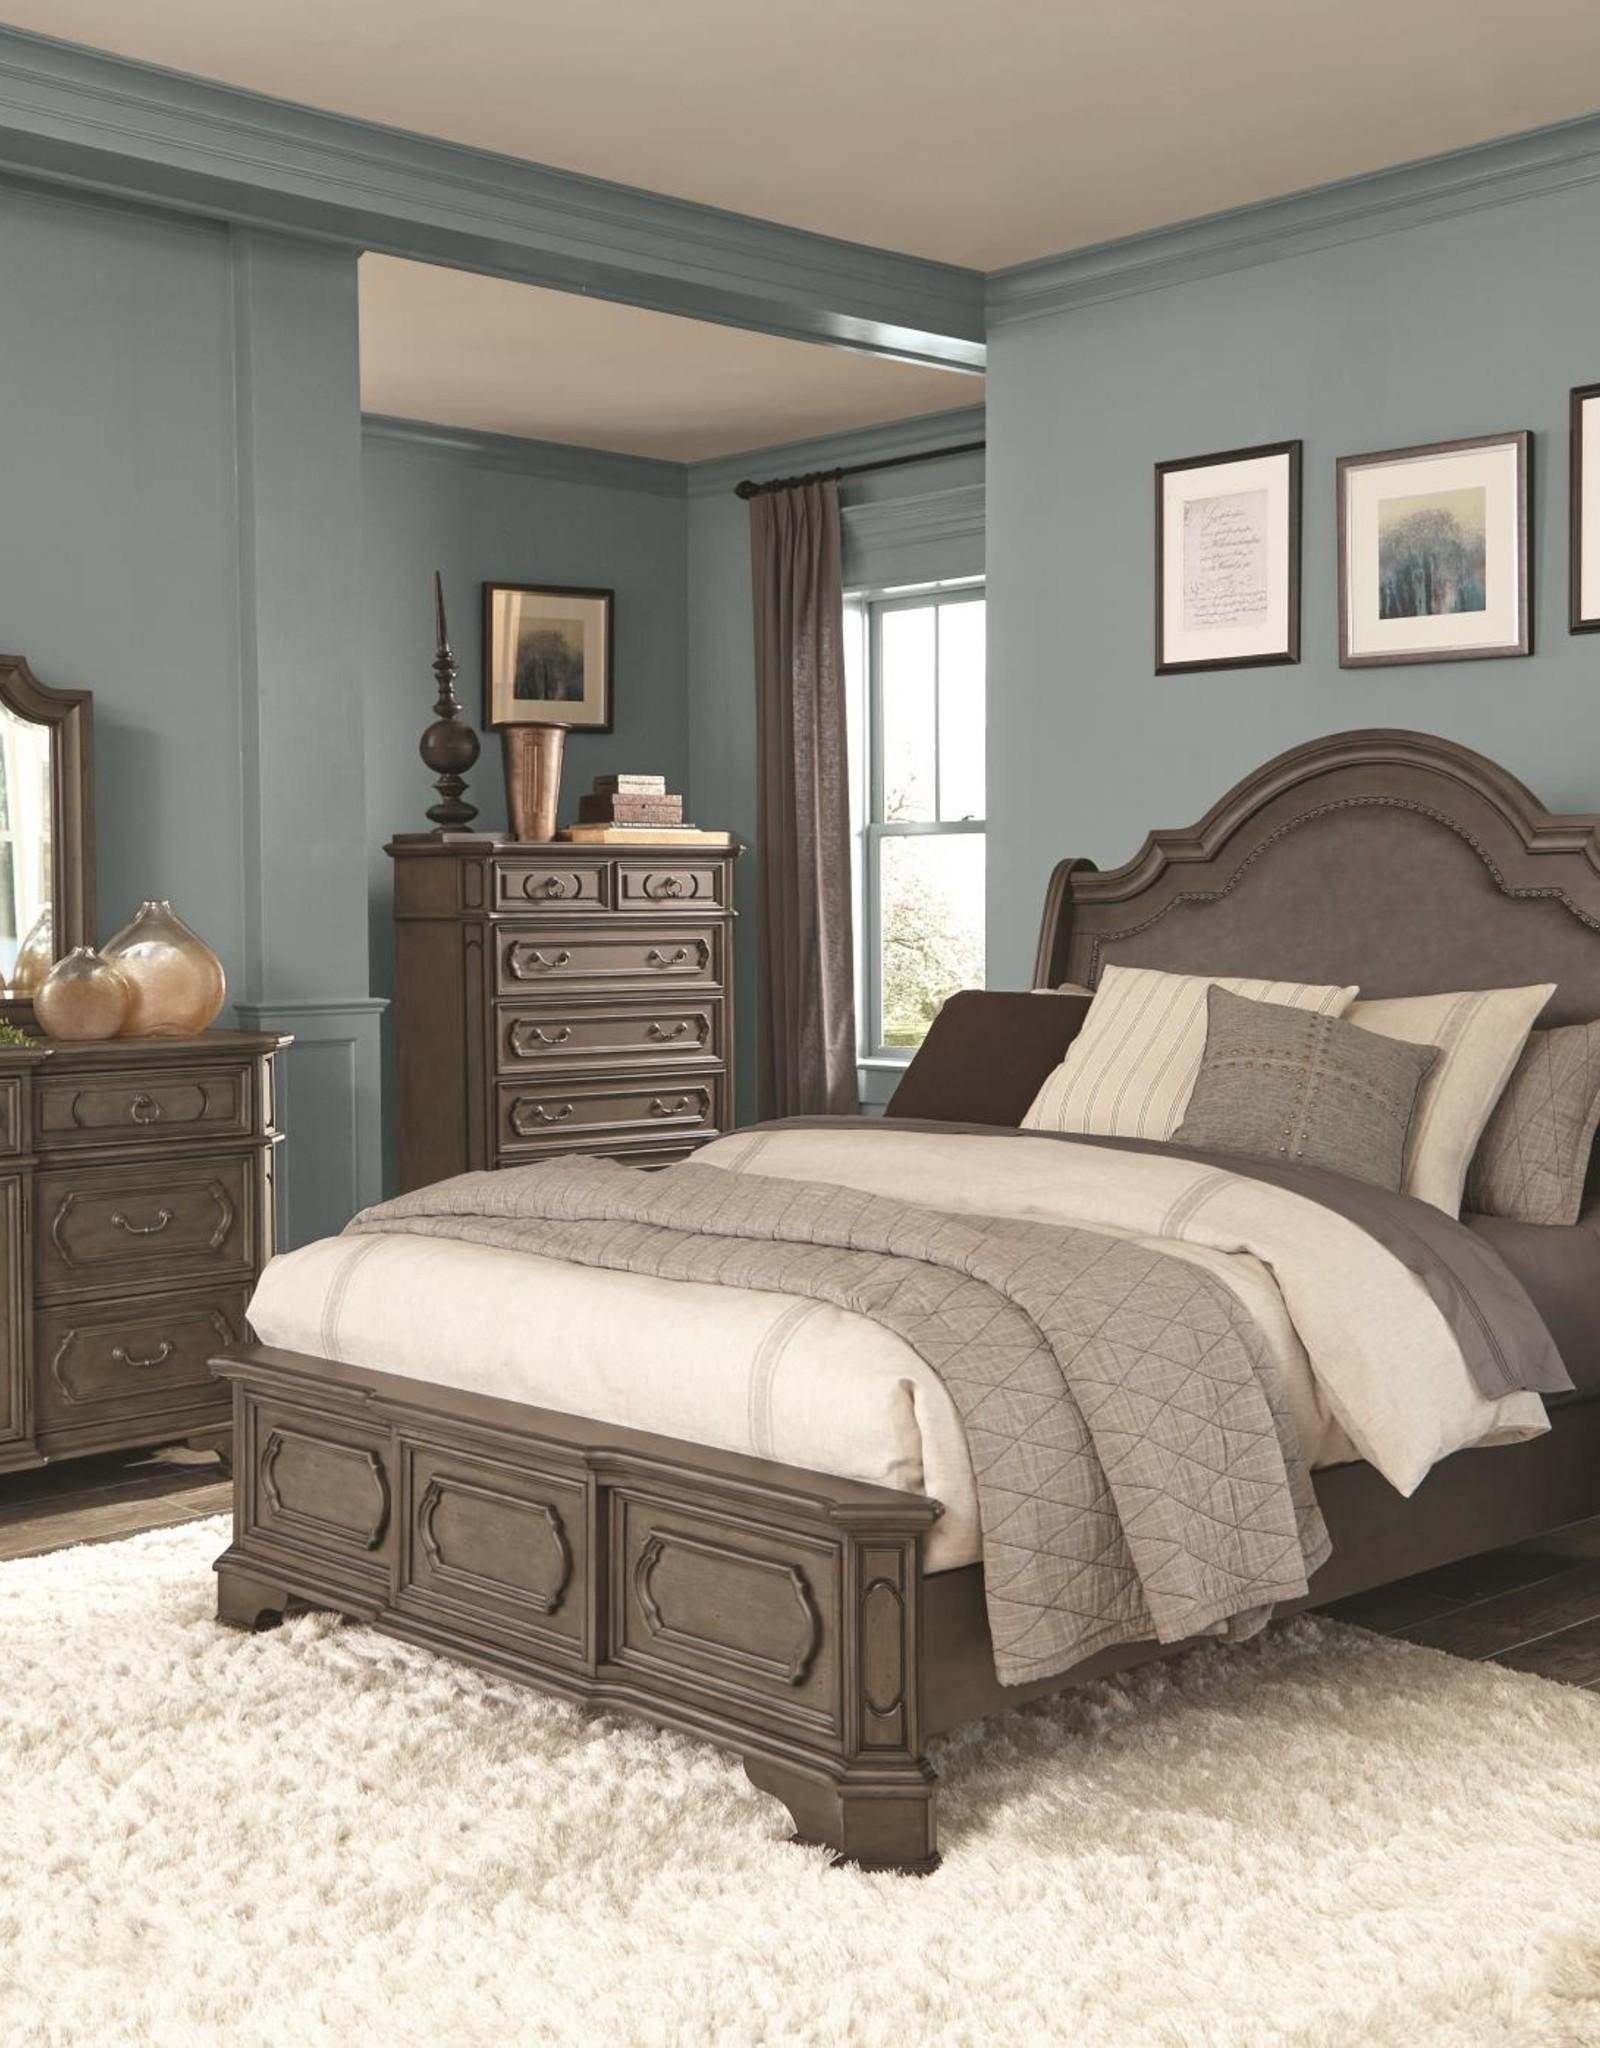 Kith Furniture Ballard Park Gray King Bed